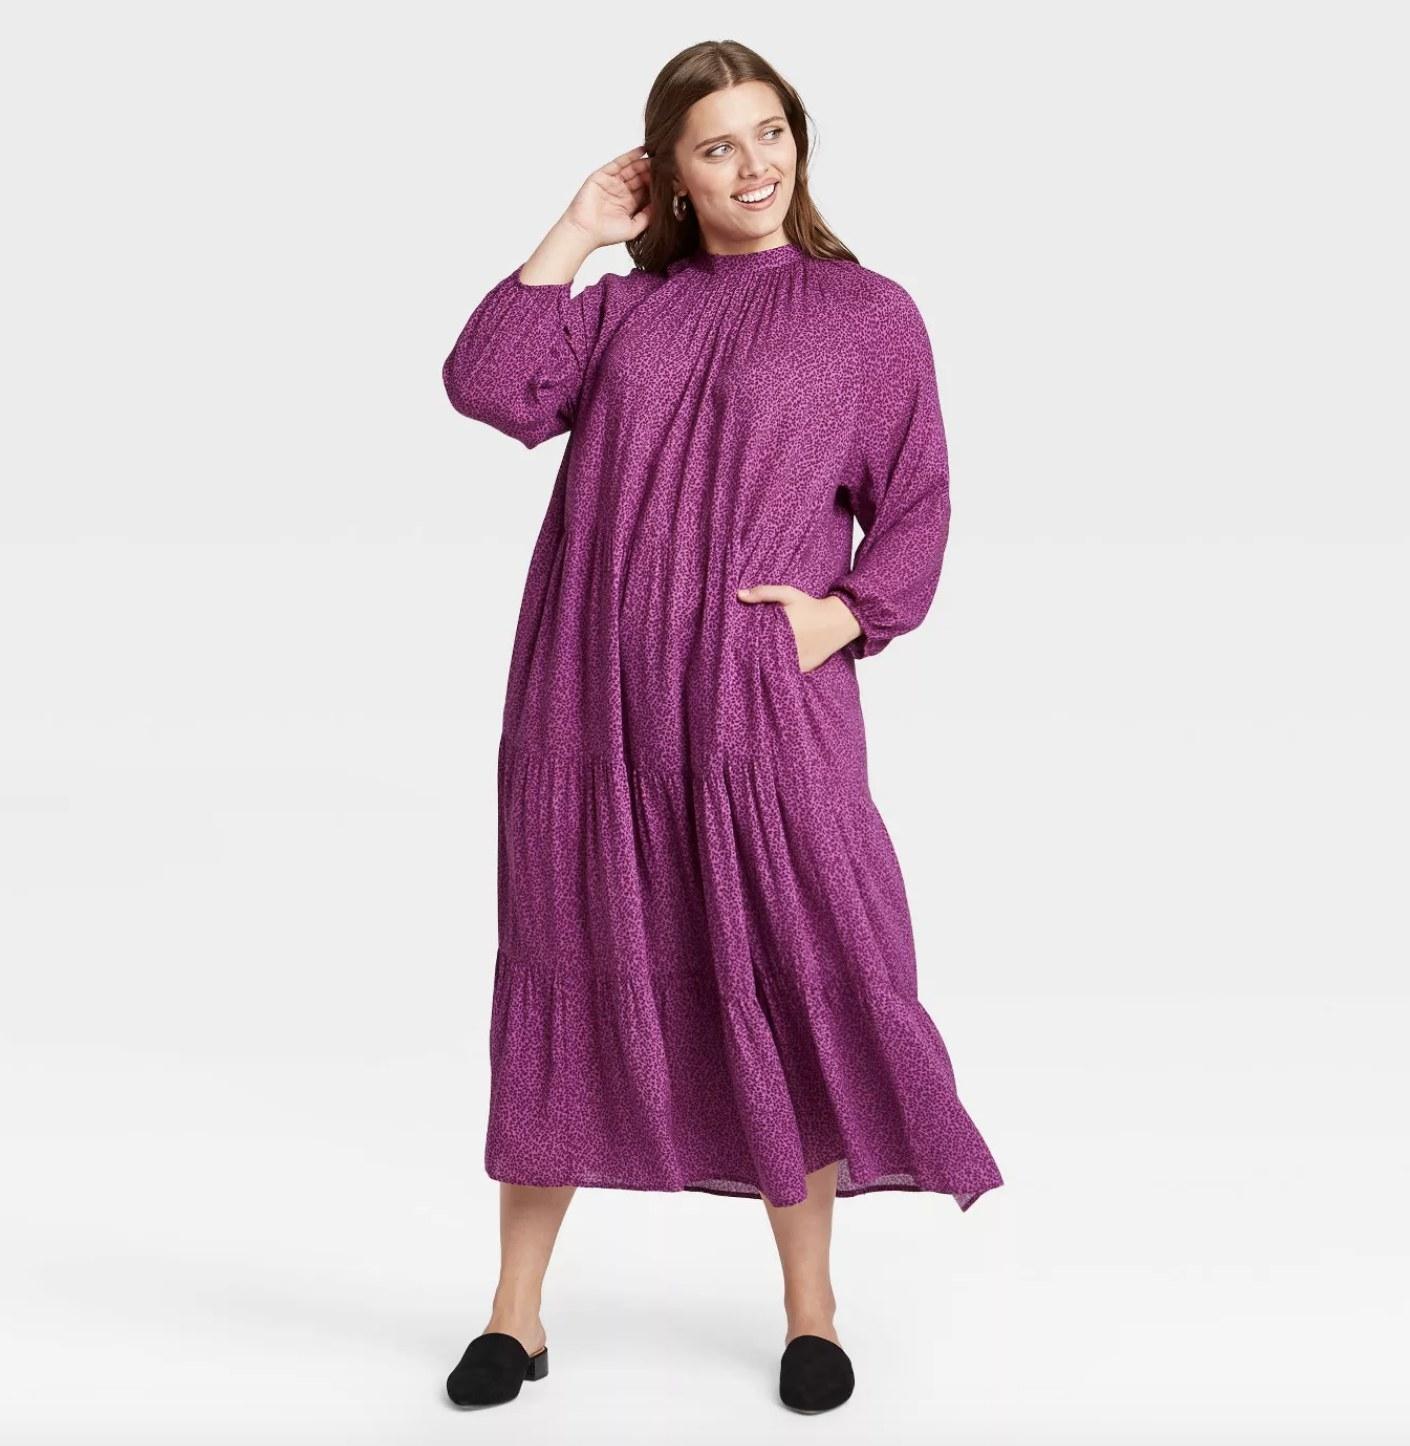 long-sleeve tiered maxi dress in purple cheetah pattern